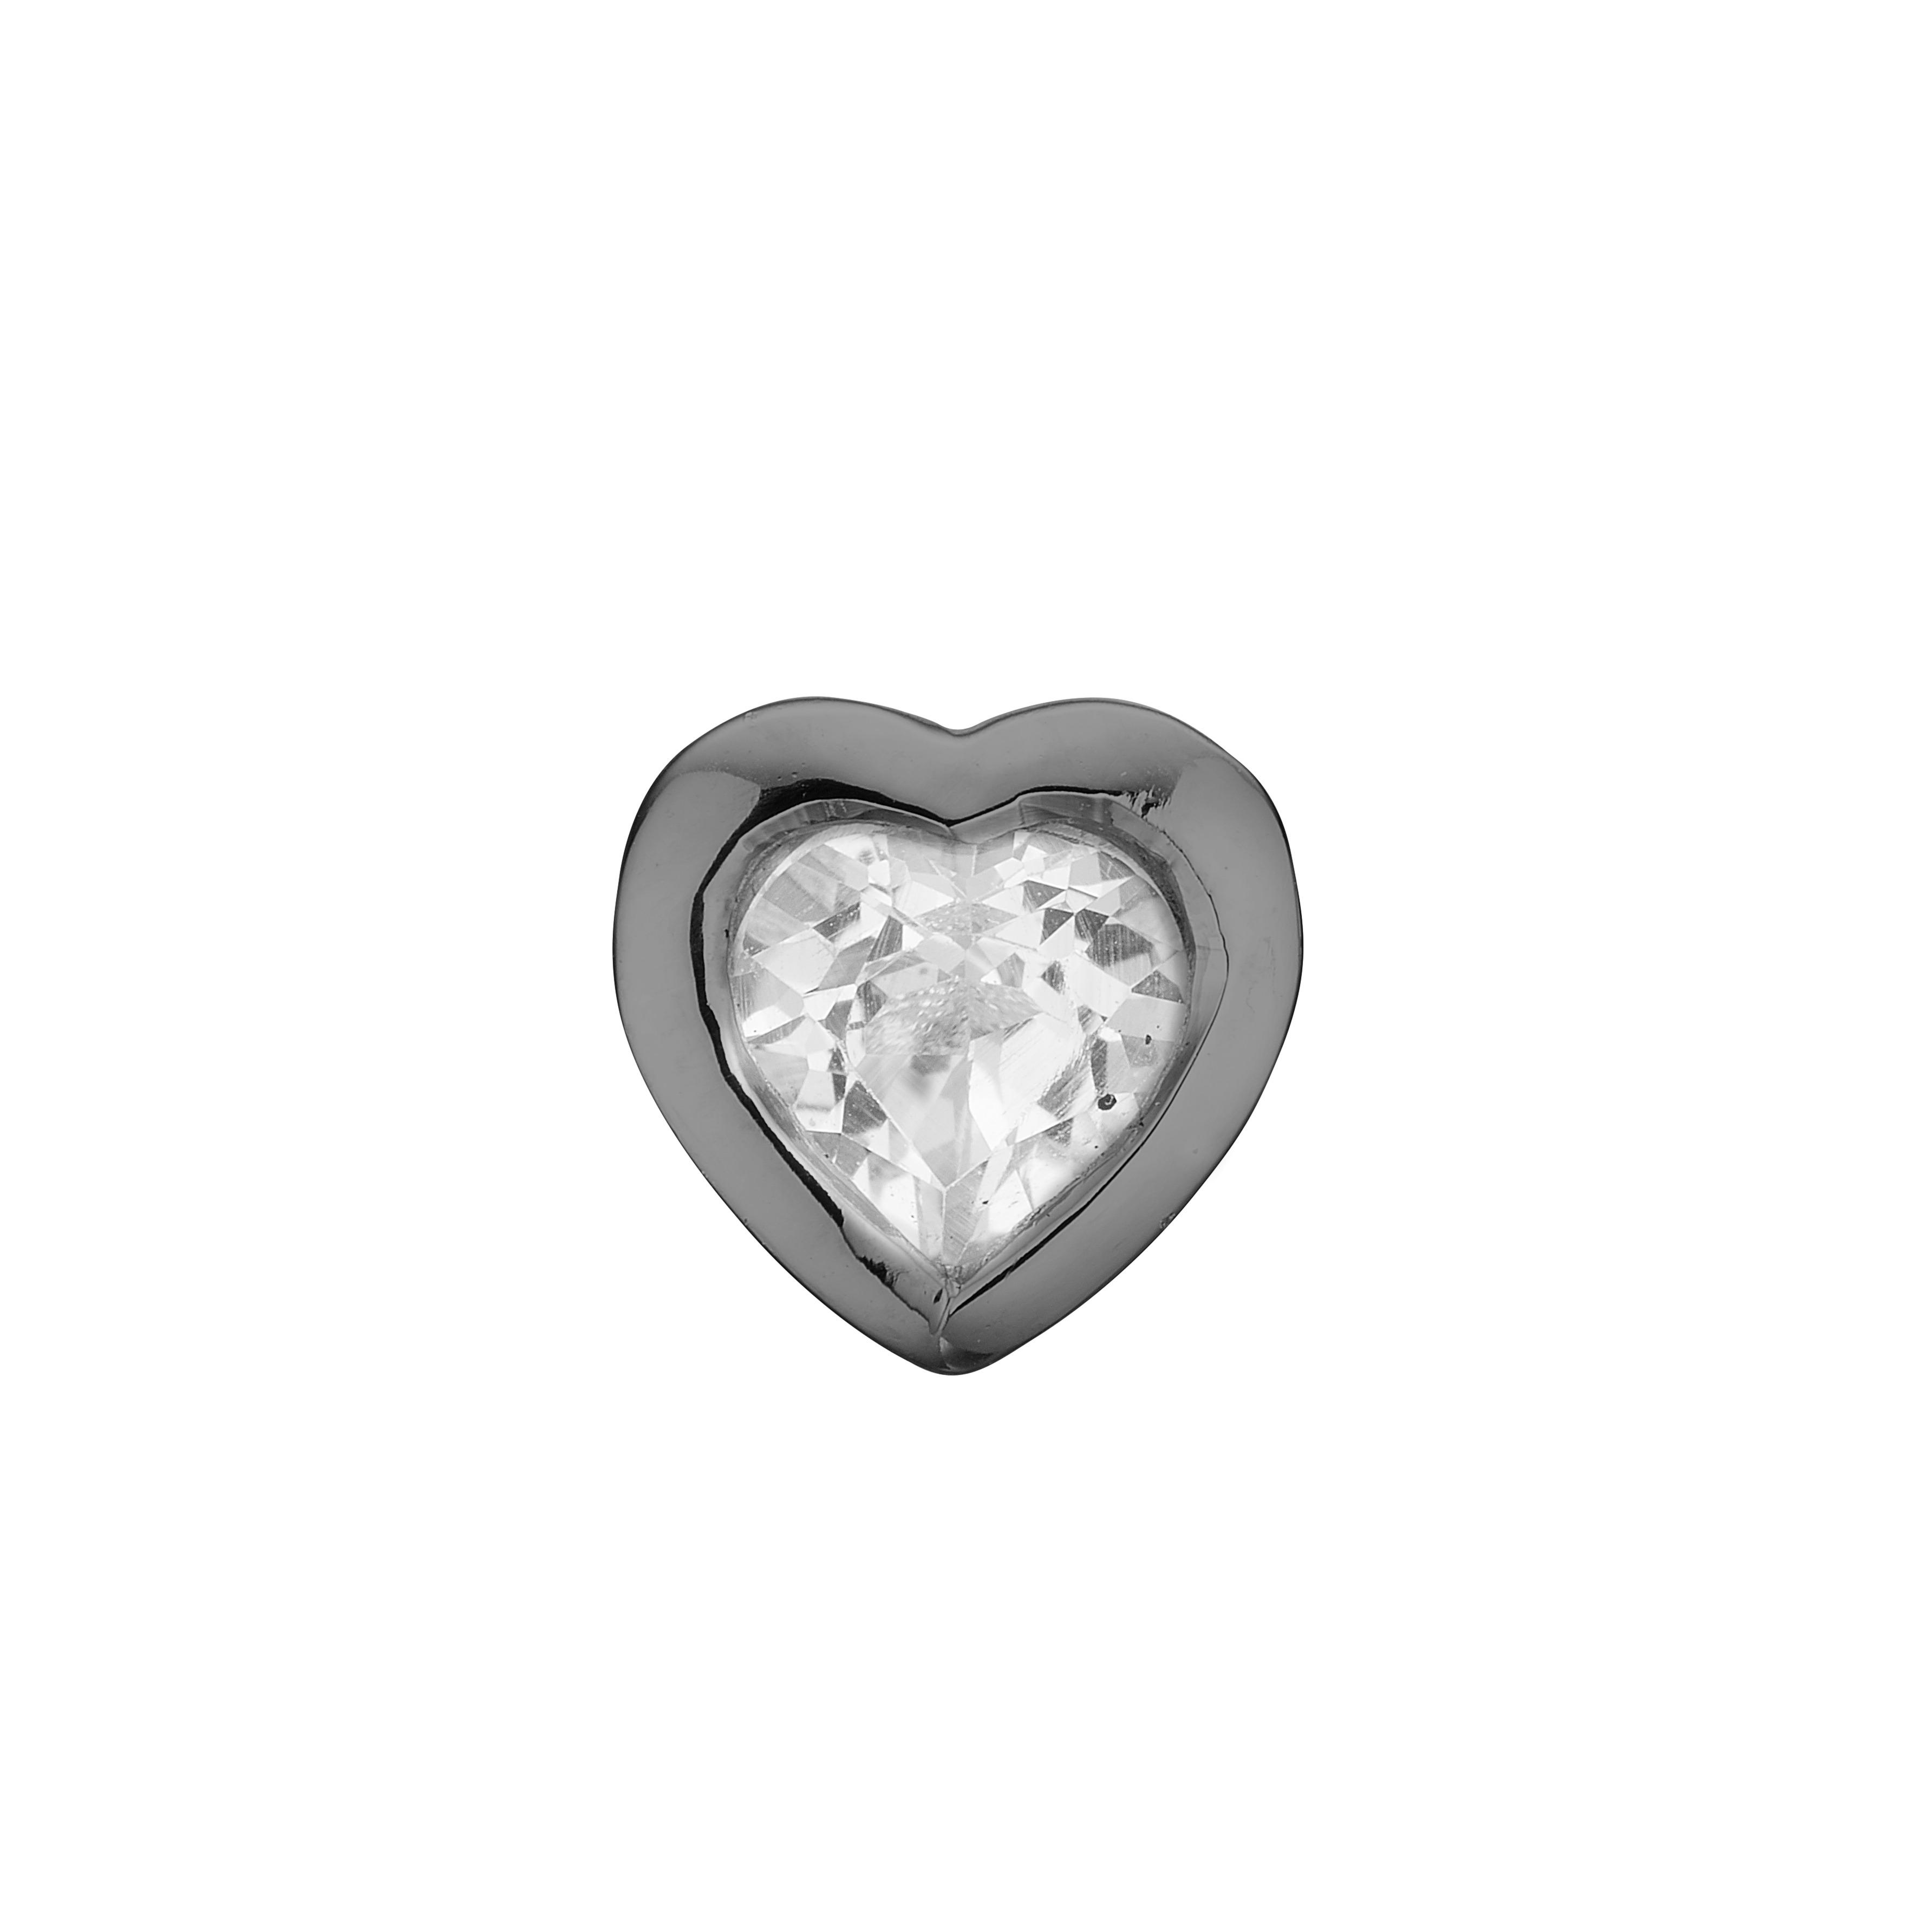 CHRISTINA Topaz Hearts - 671-B16